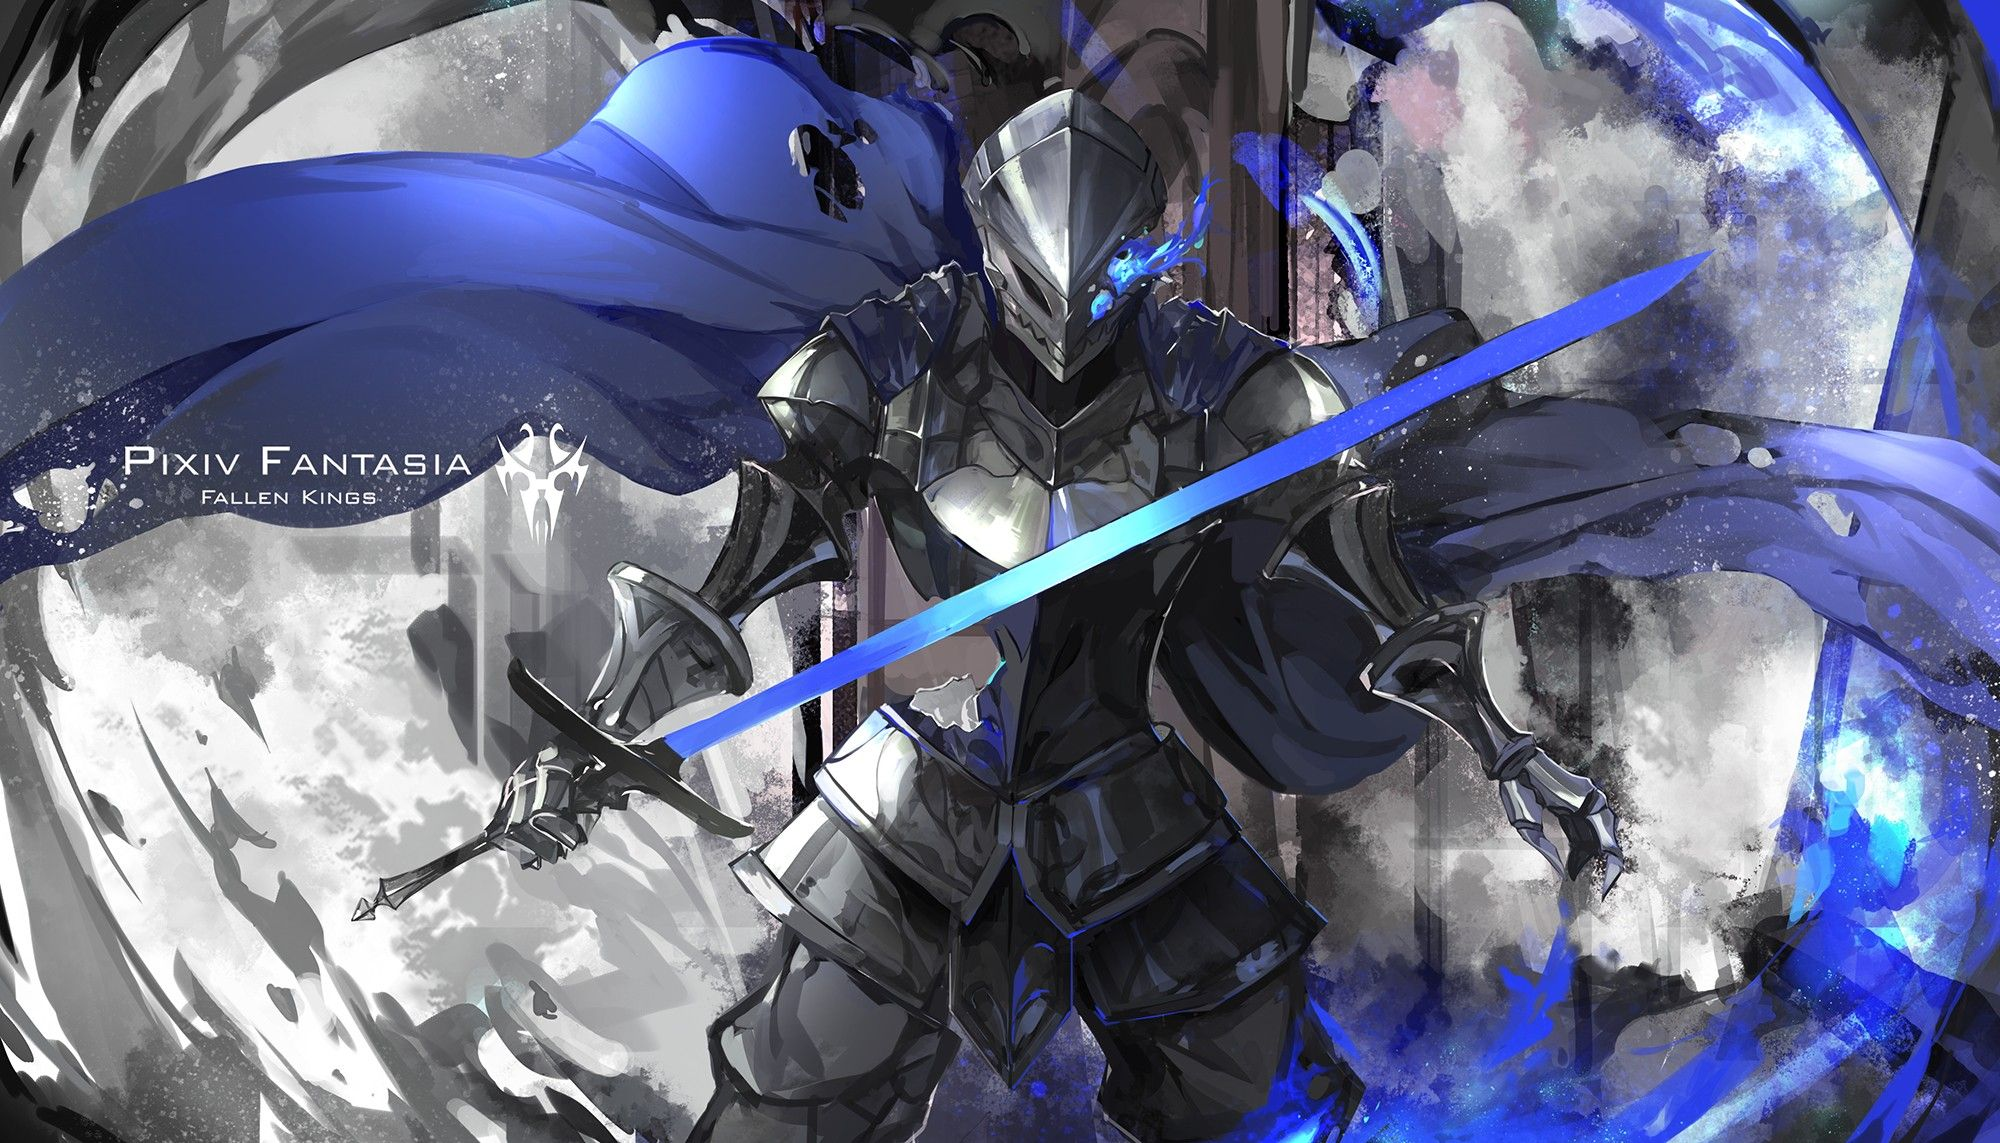 Anime 2000x1143 Pixiv Fantasia Fallen Kings Original Characters